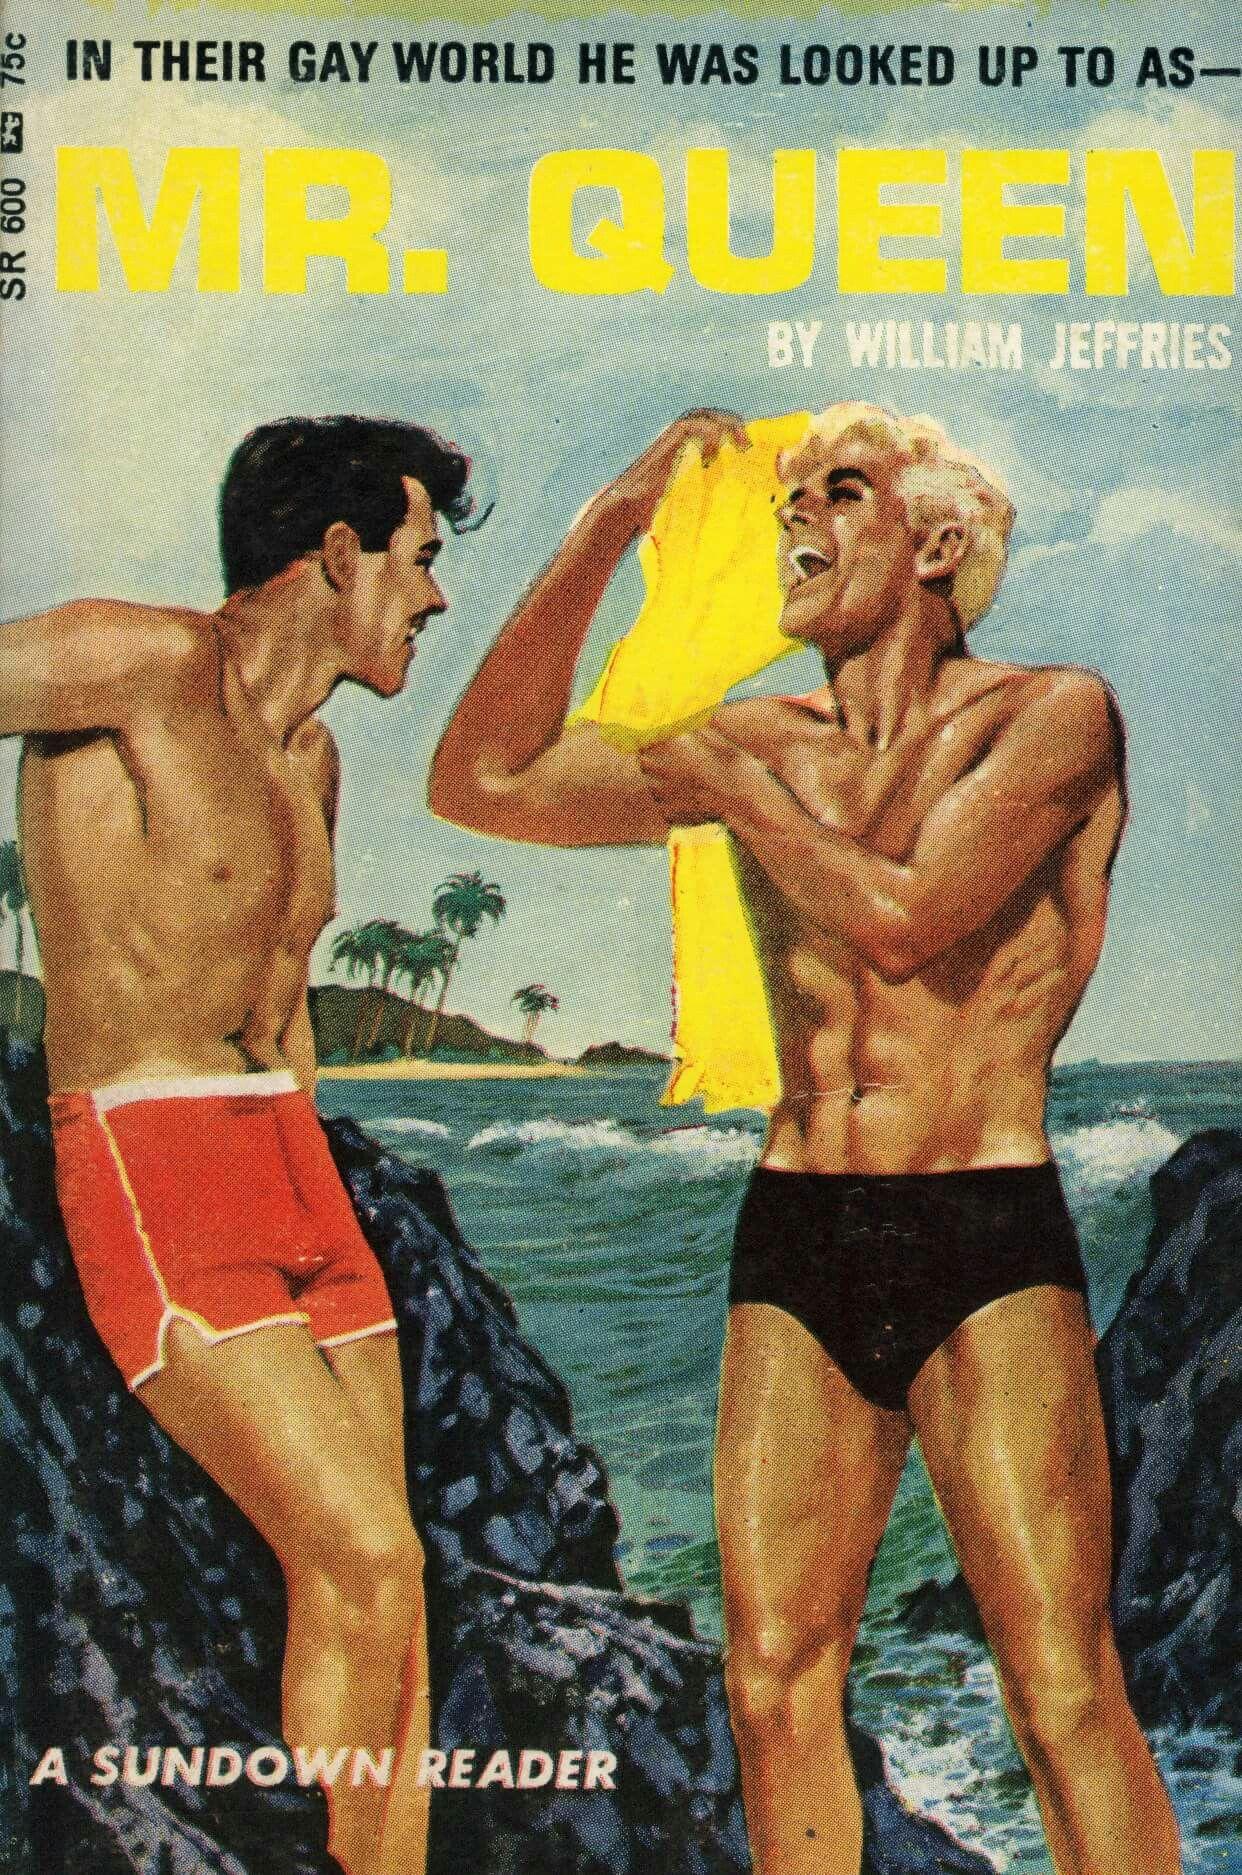 from Vaughn vintage gay pulp